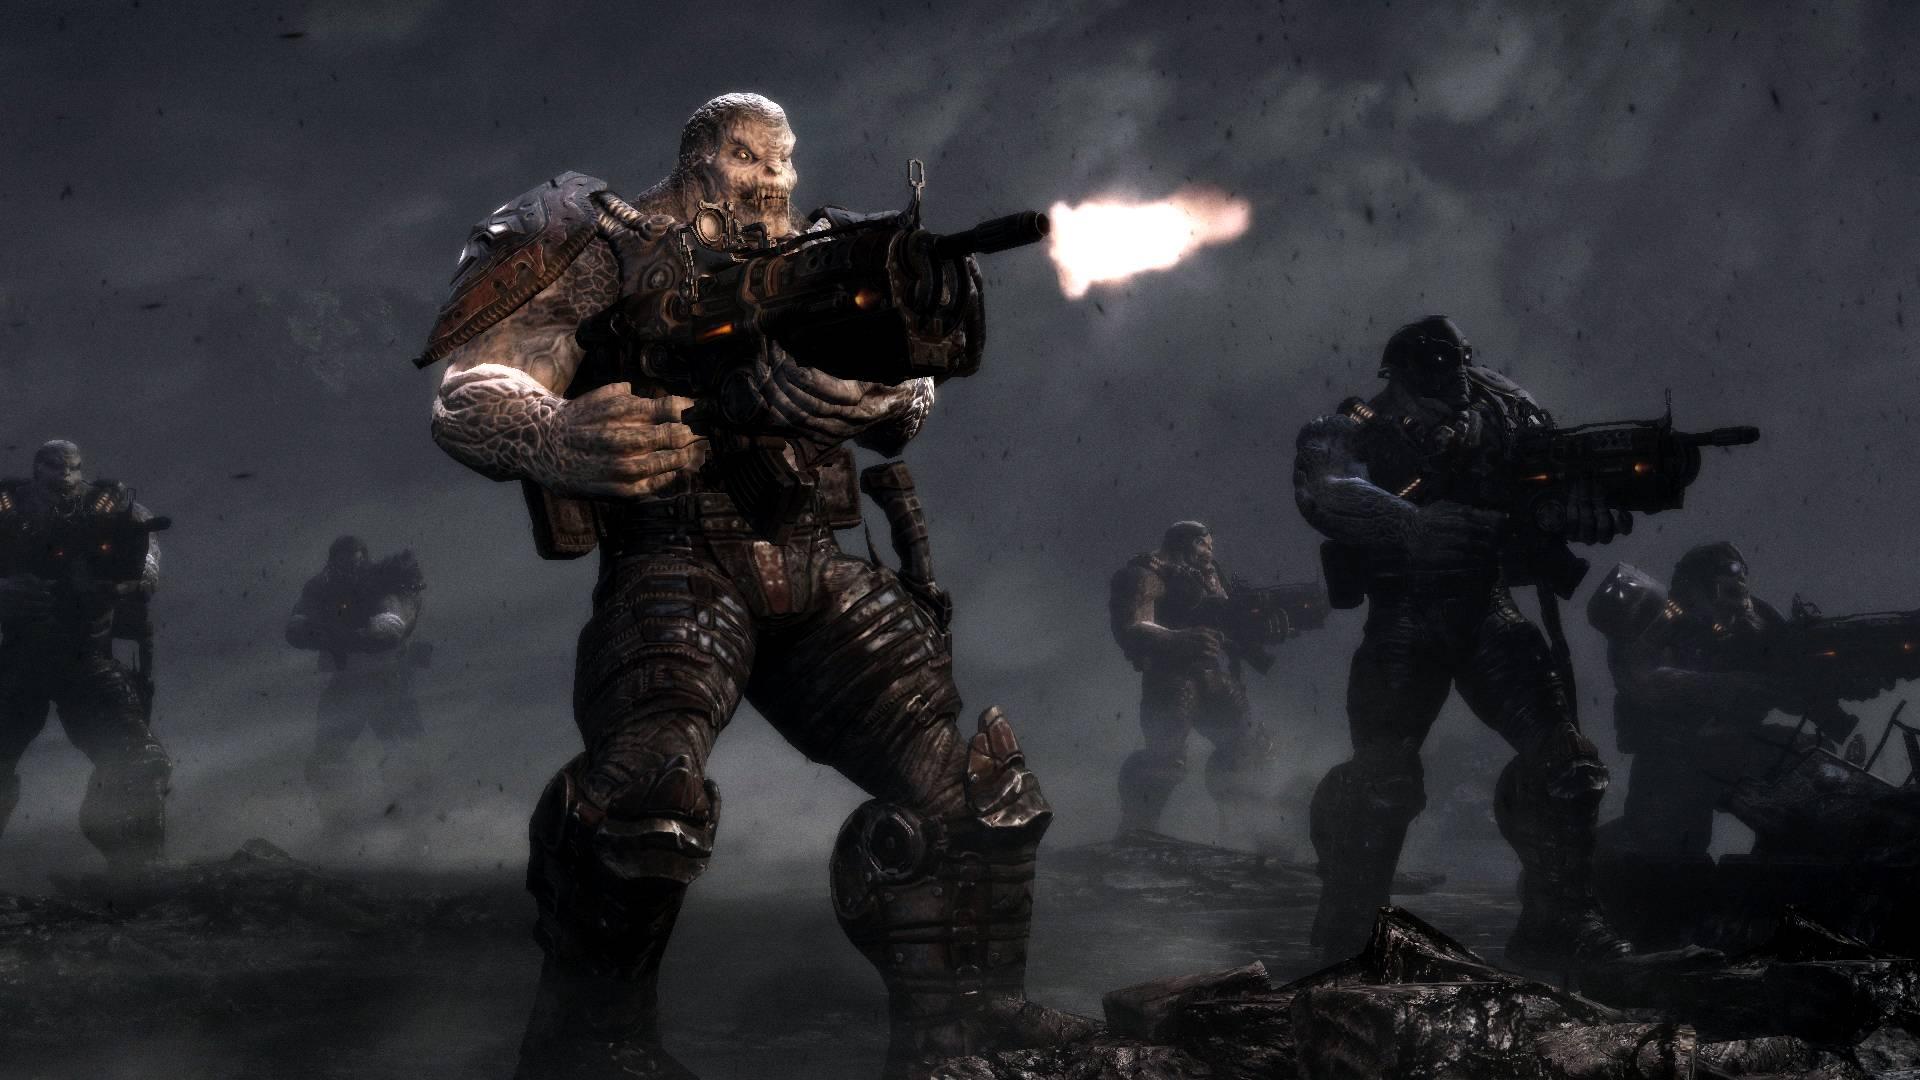 Gears Of War 3 Versus Gears Of War 2  HD Screenshot  Parison